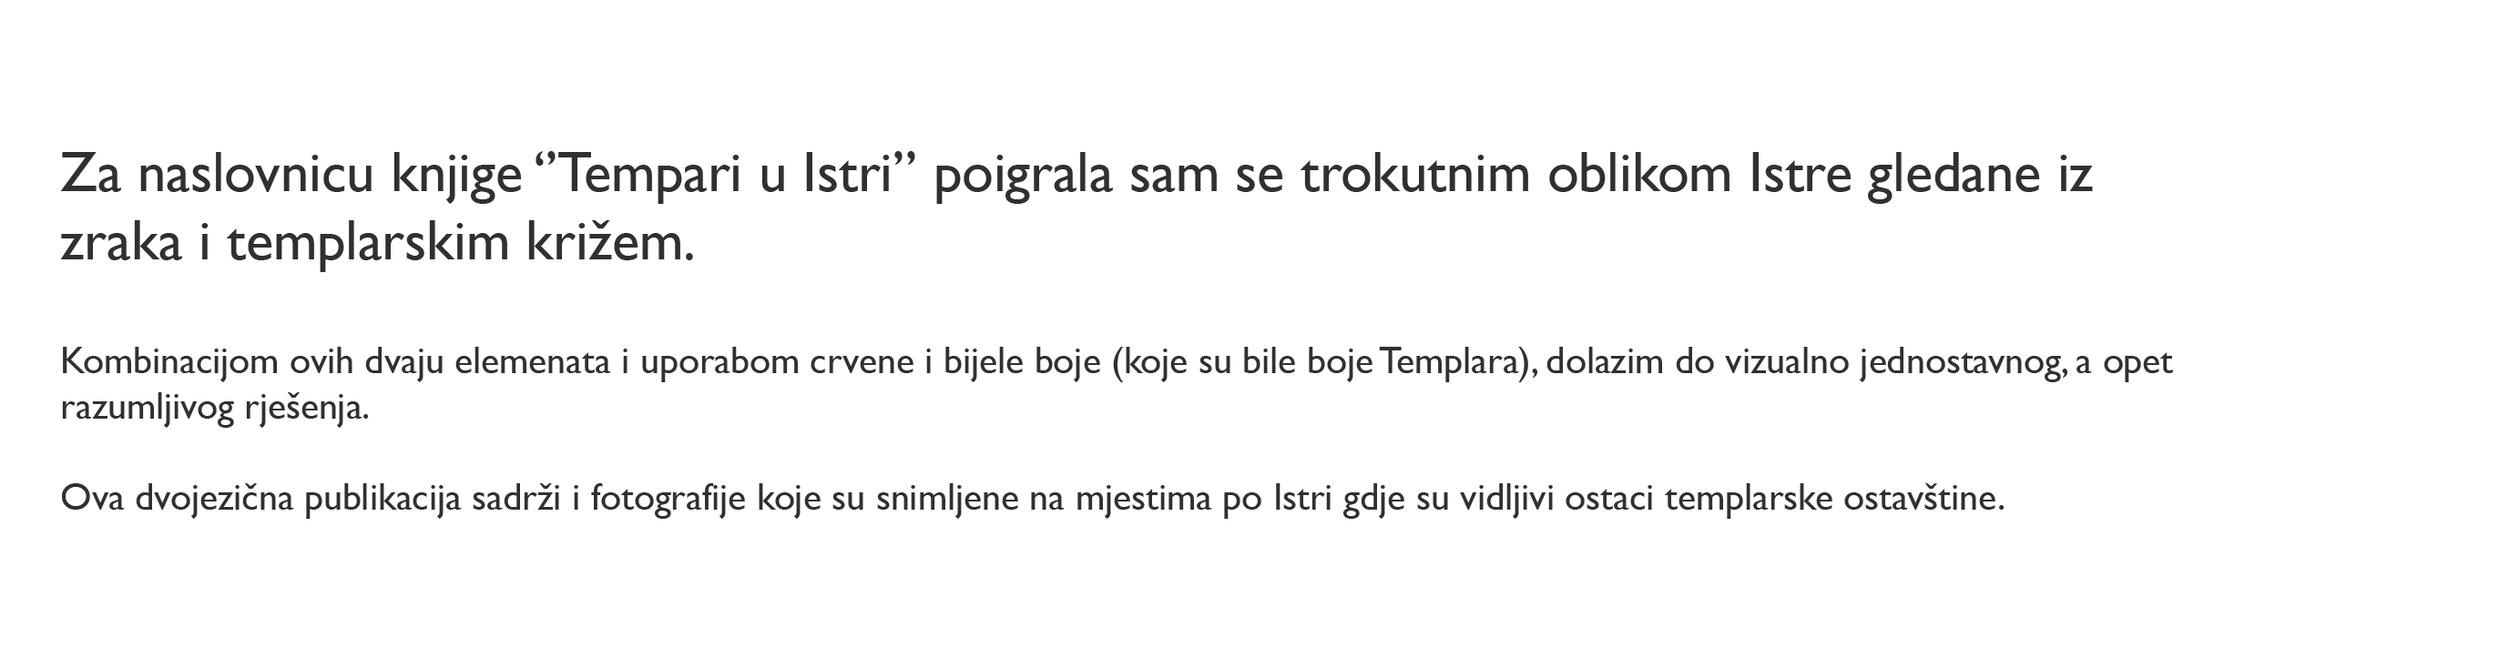 templari-04.png